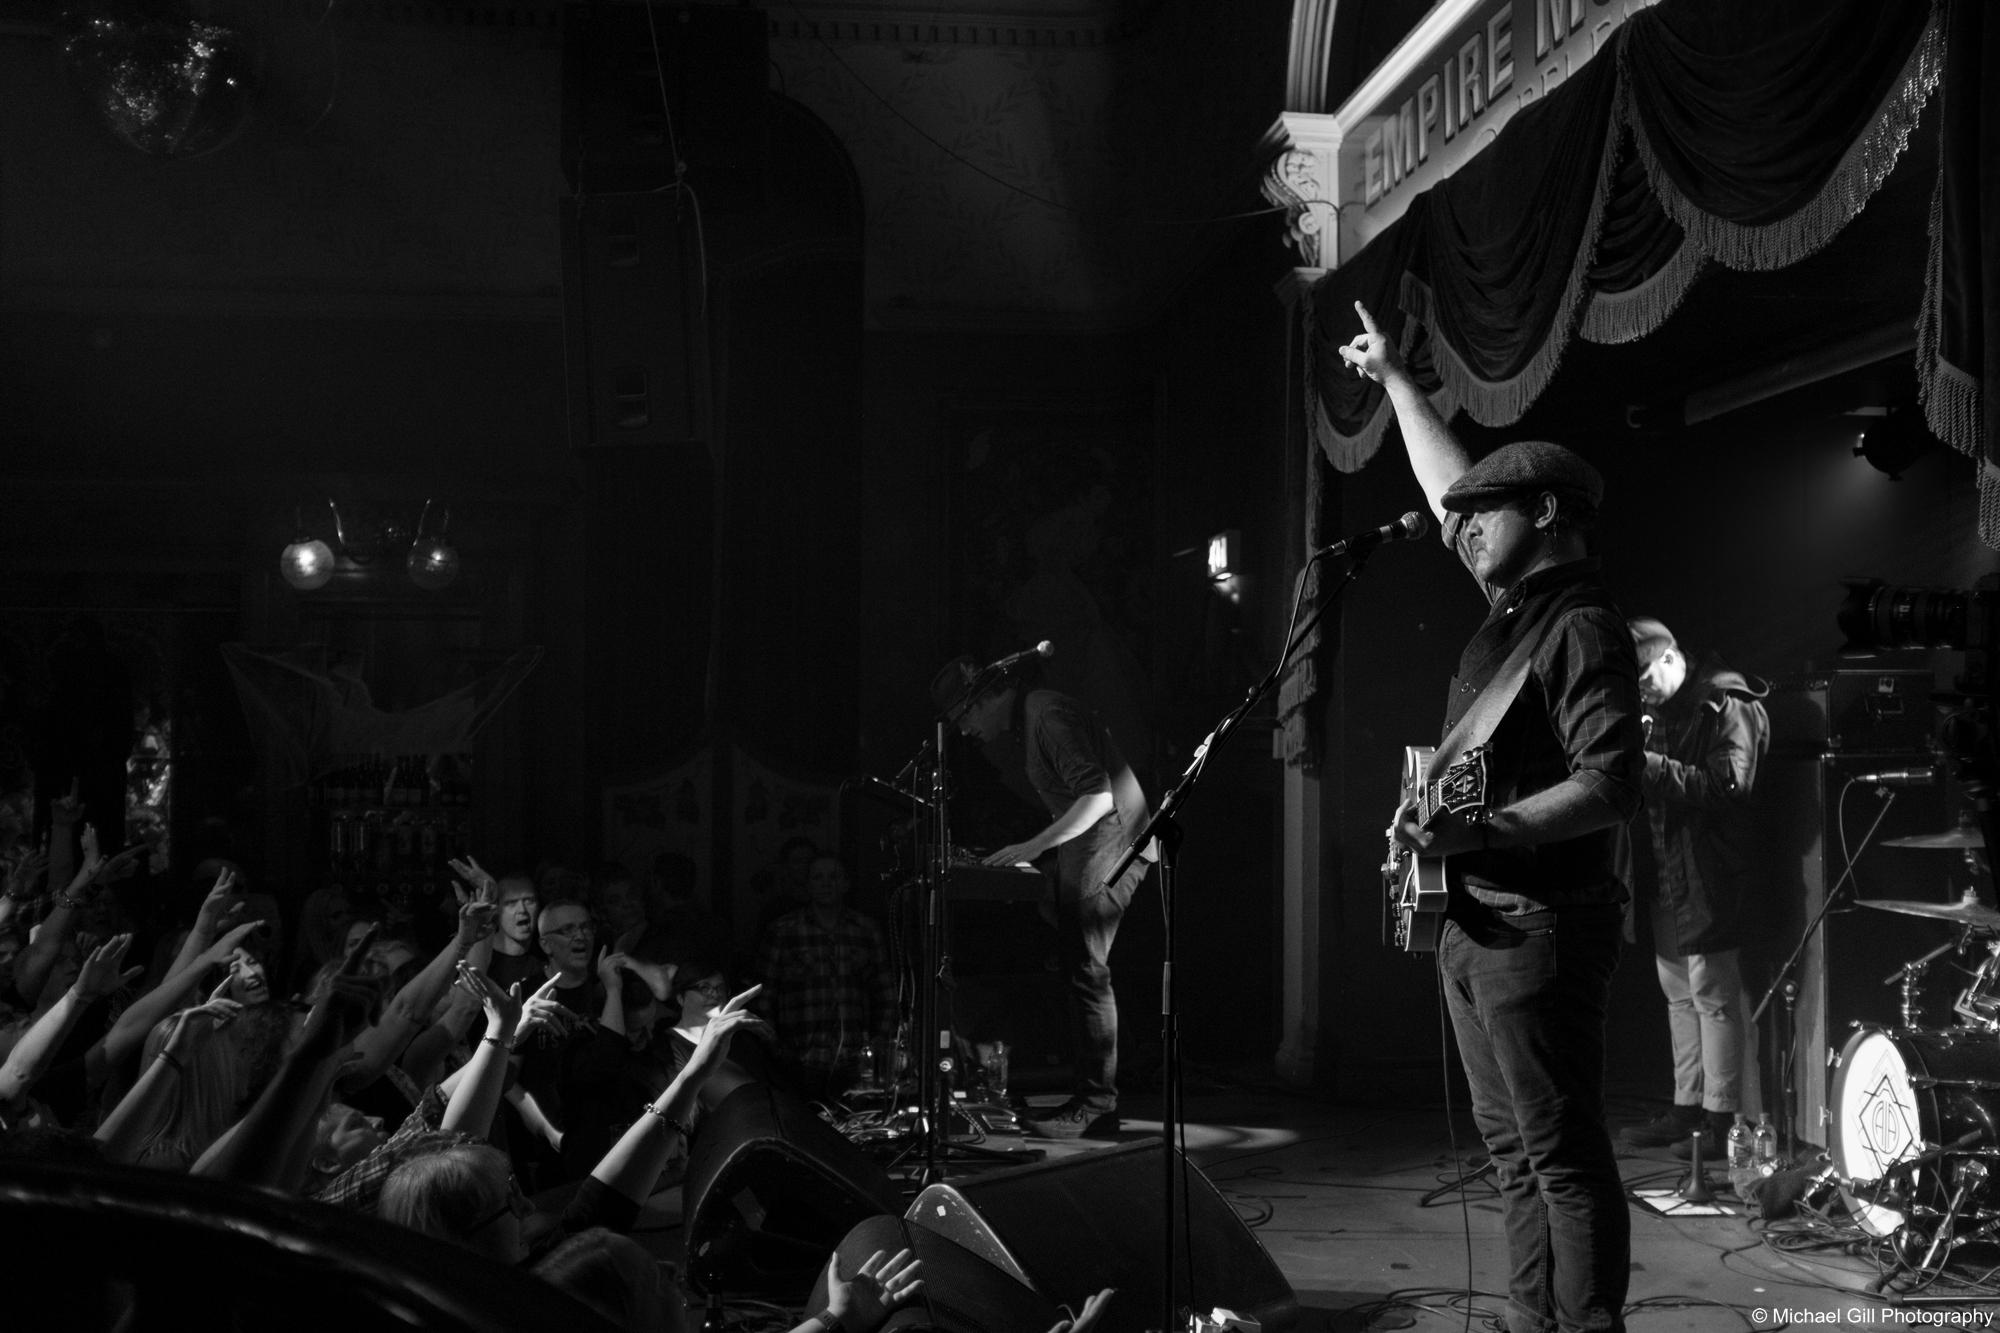 Michael_Gill_Photography_ Augustines_Empire_Belfast_4.jpg